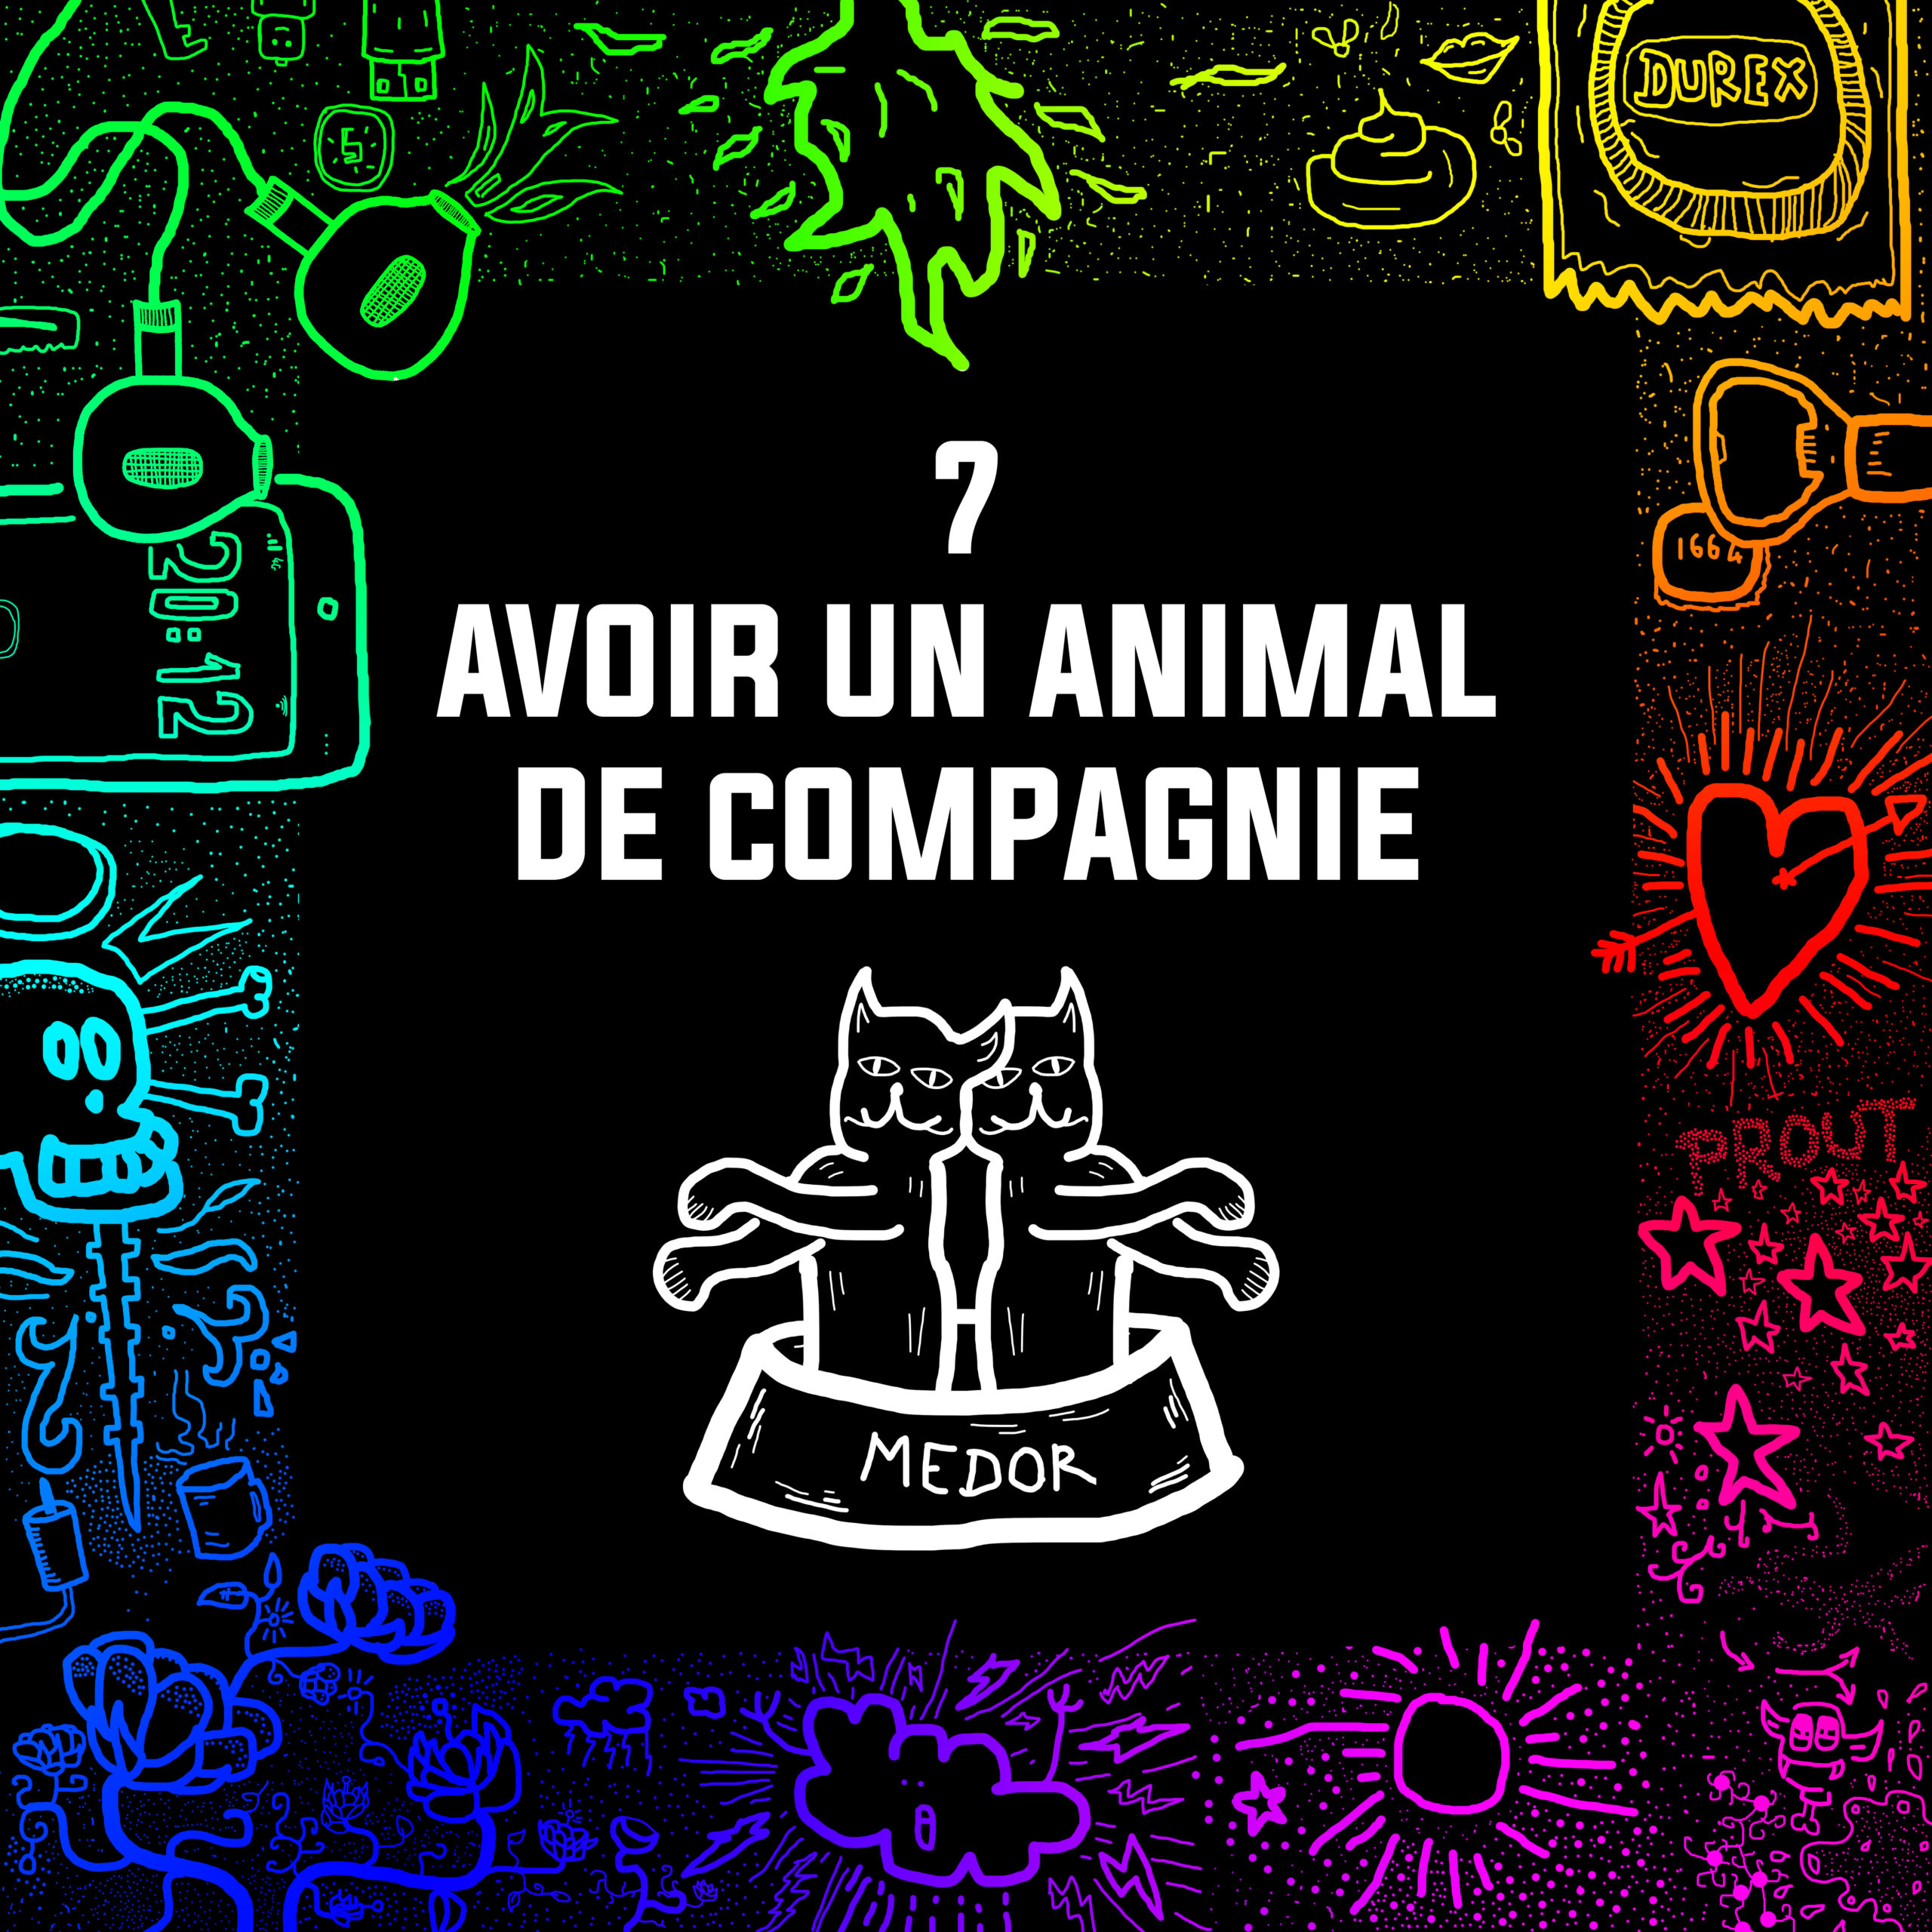 #07 – Avoir un animal de compagnie